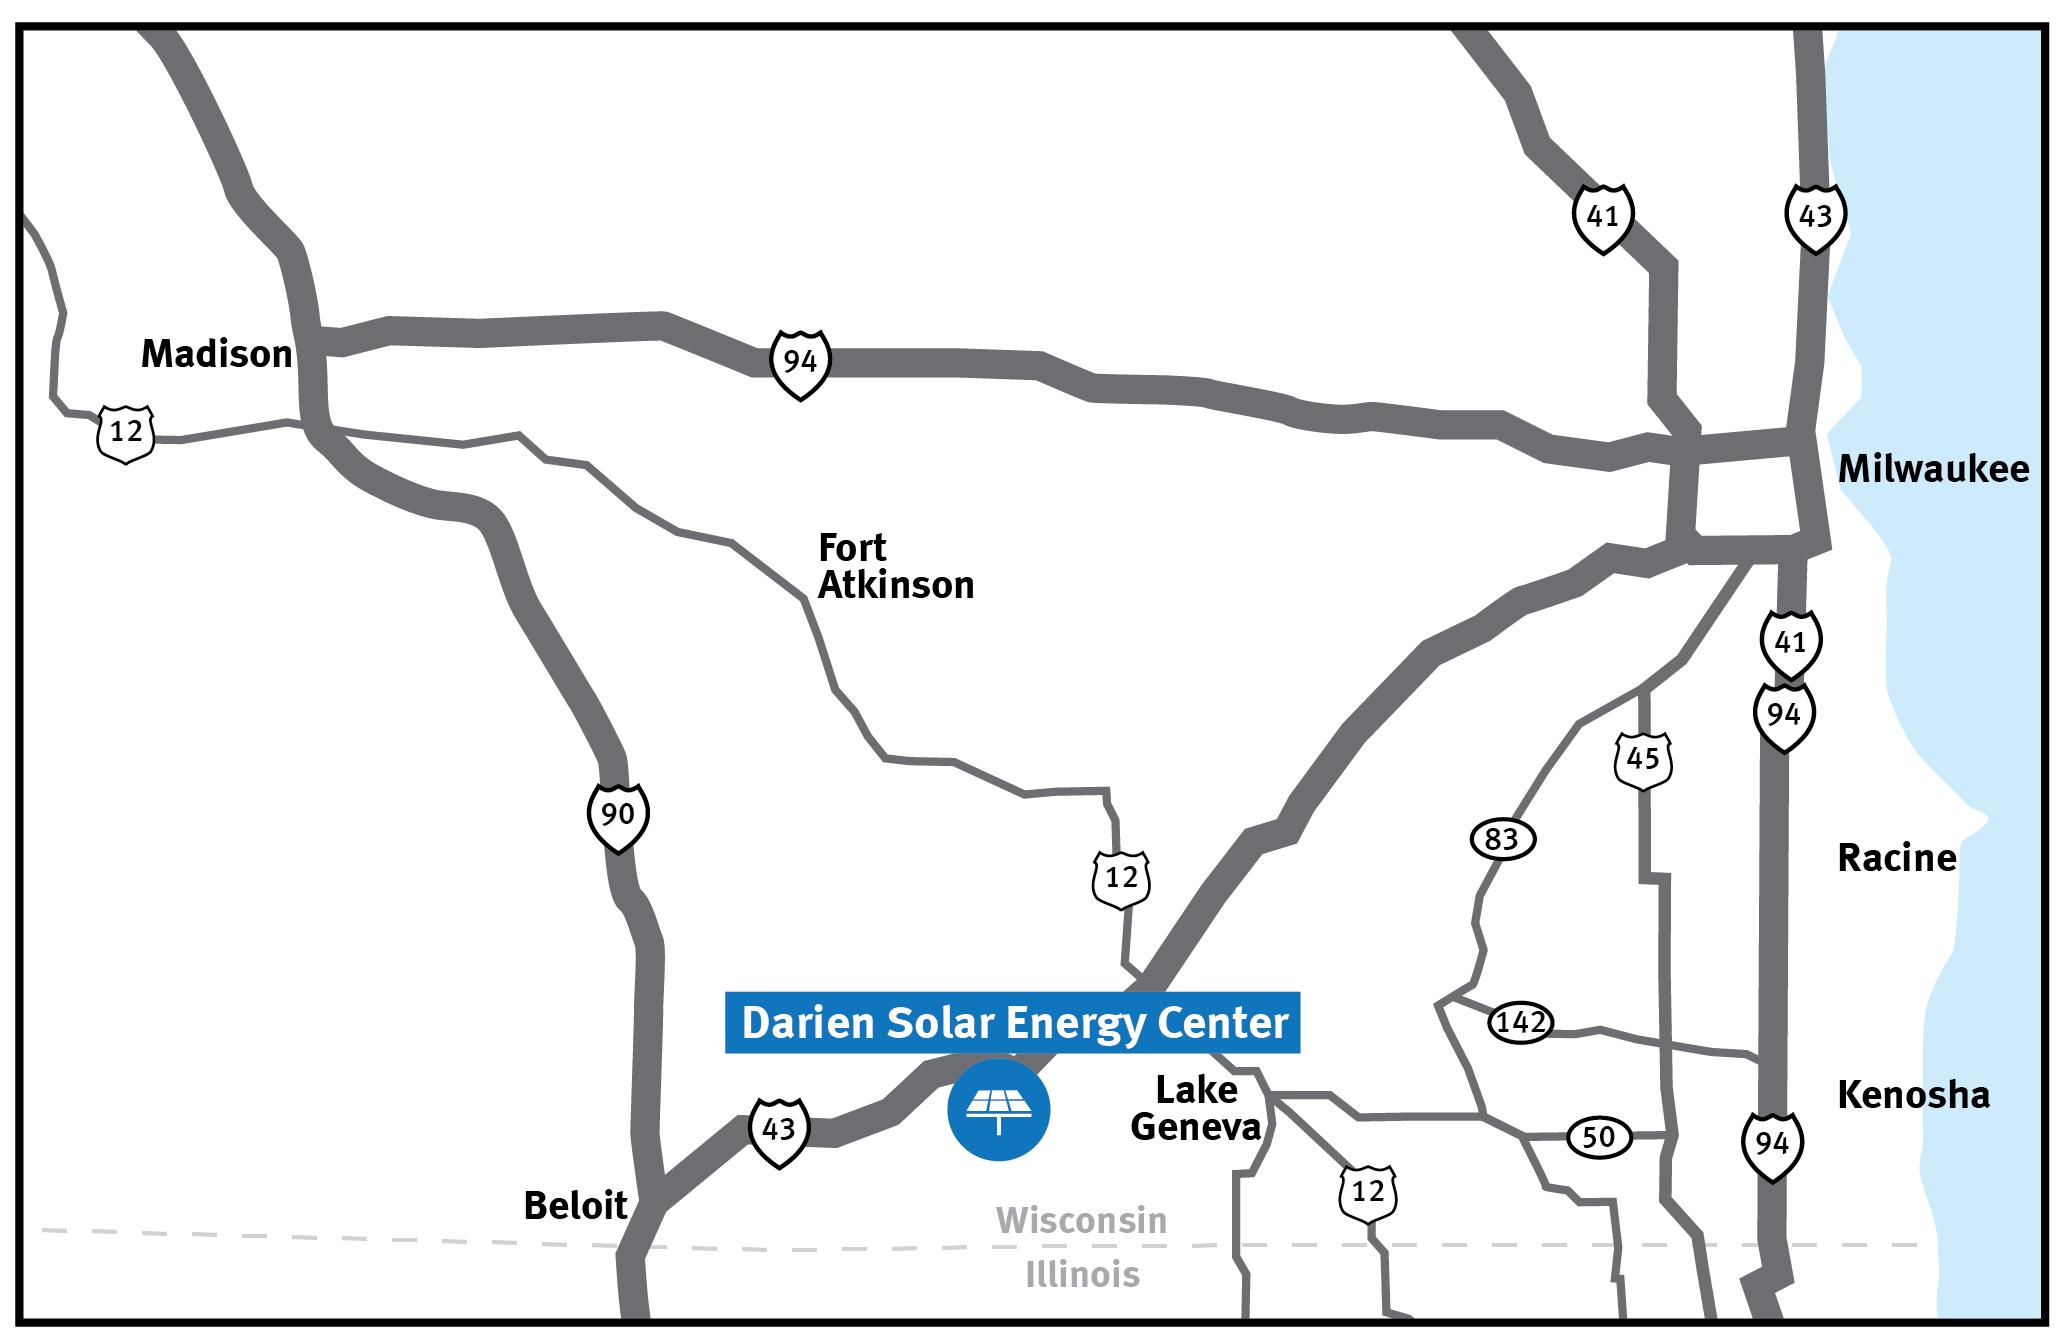 Map of Darien Solar Energy Center